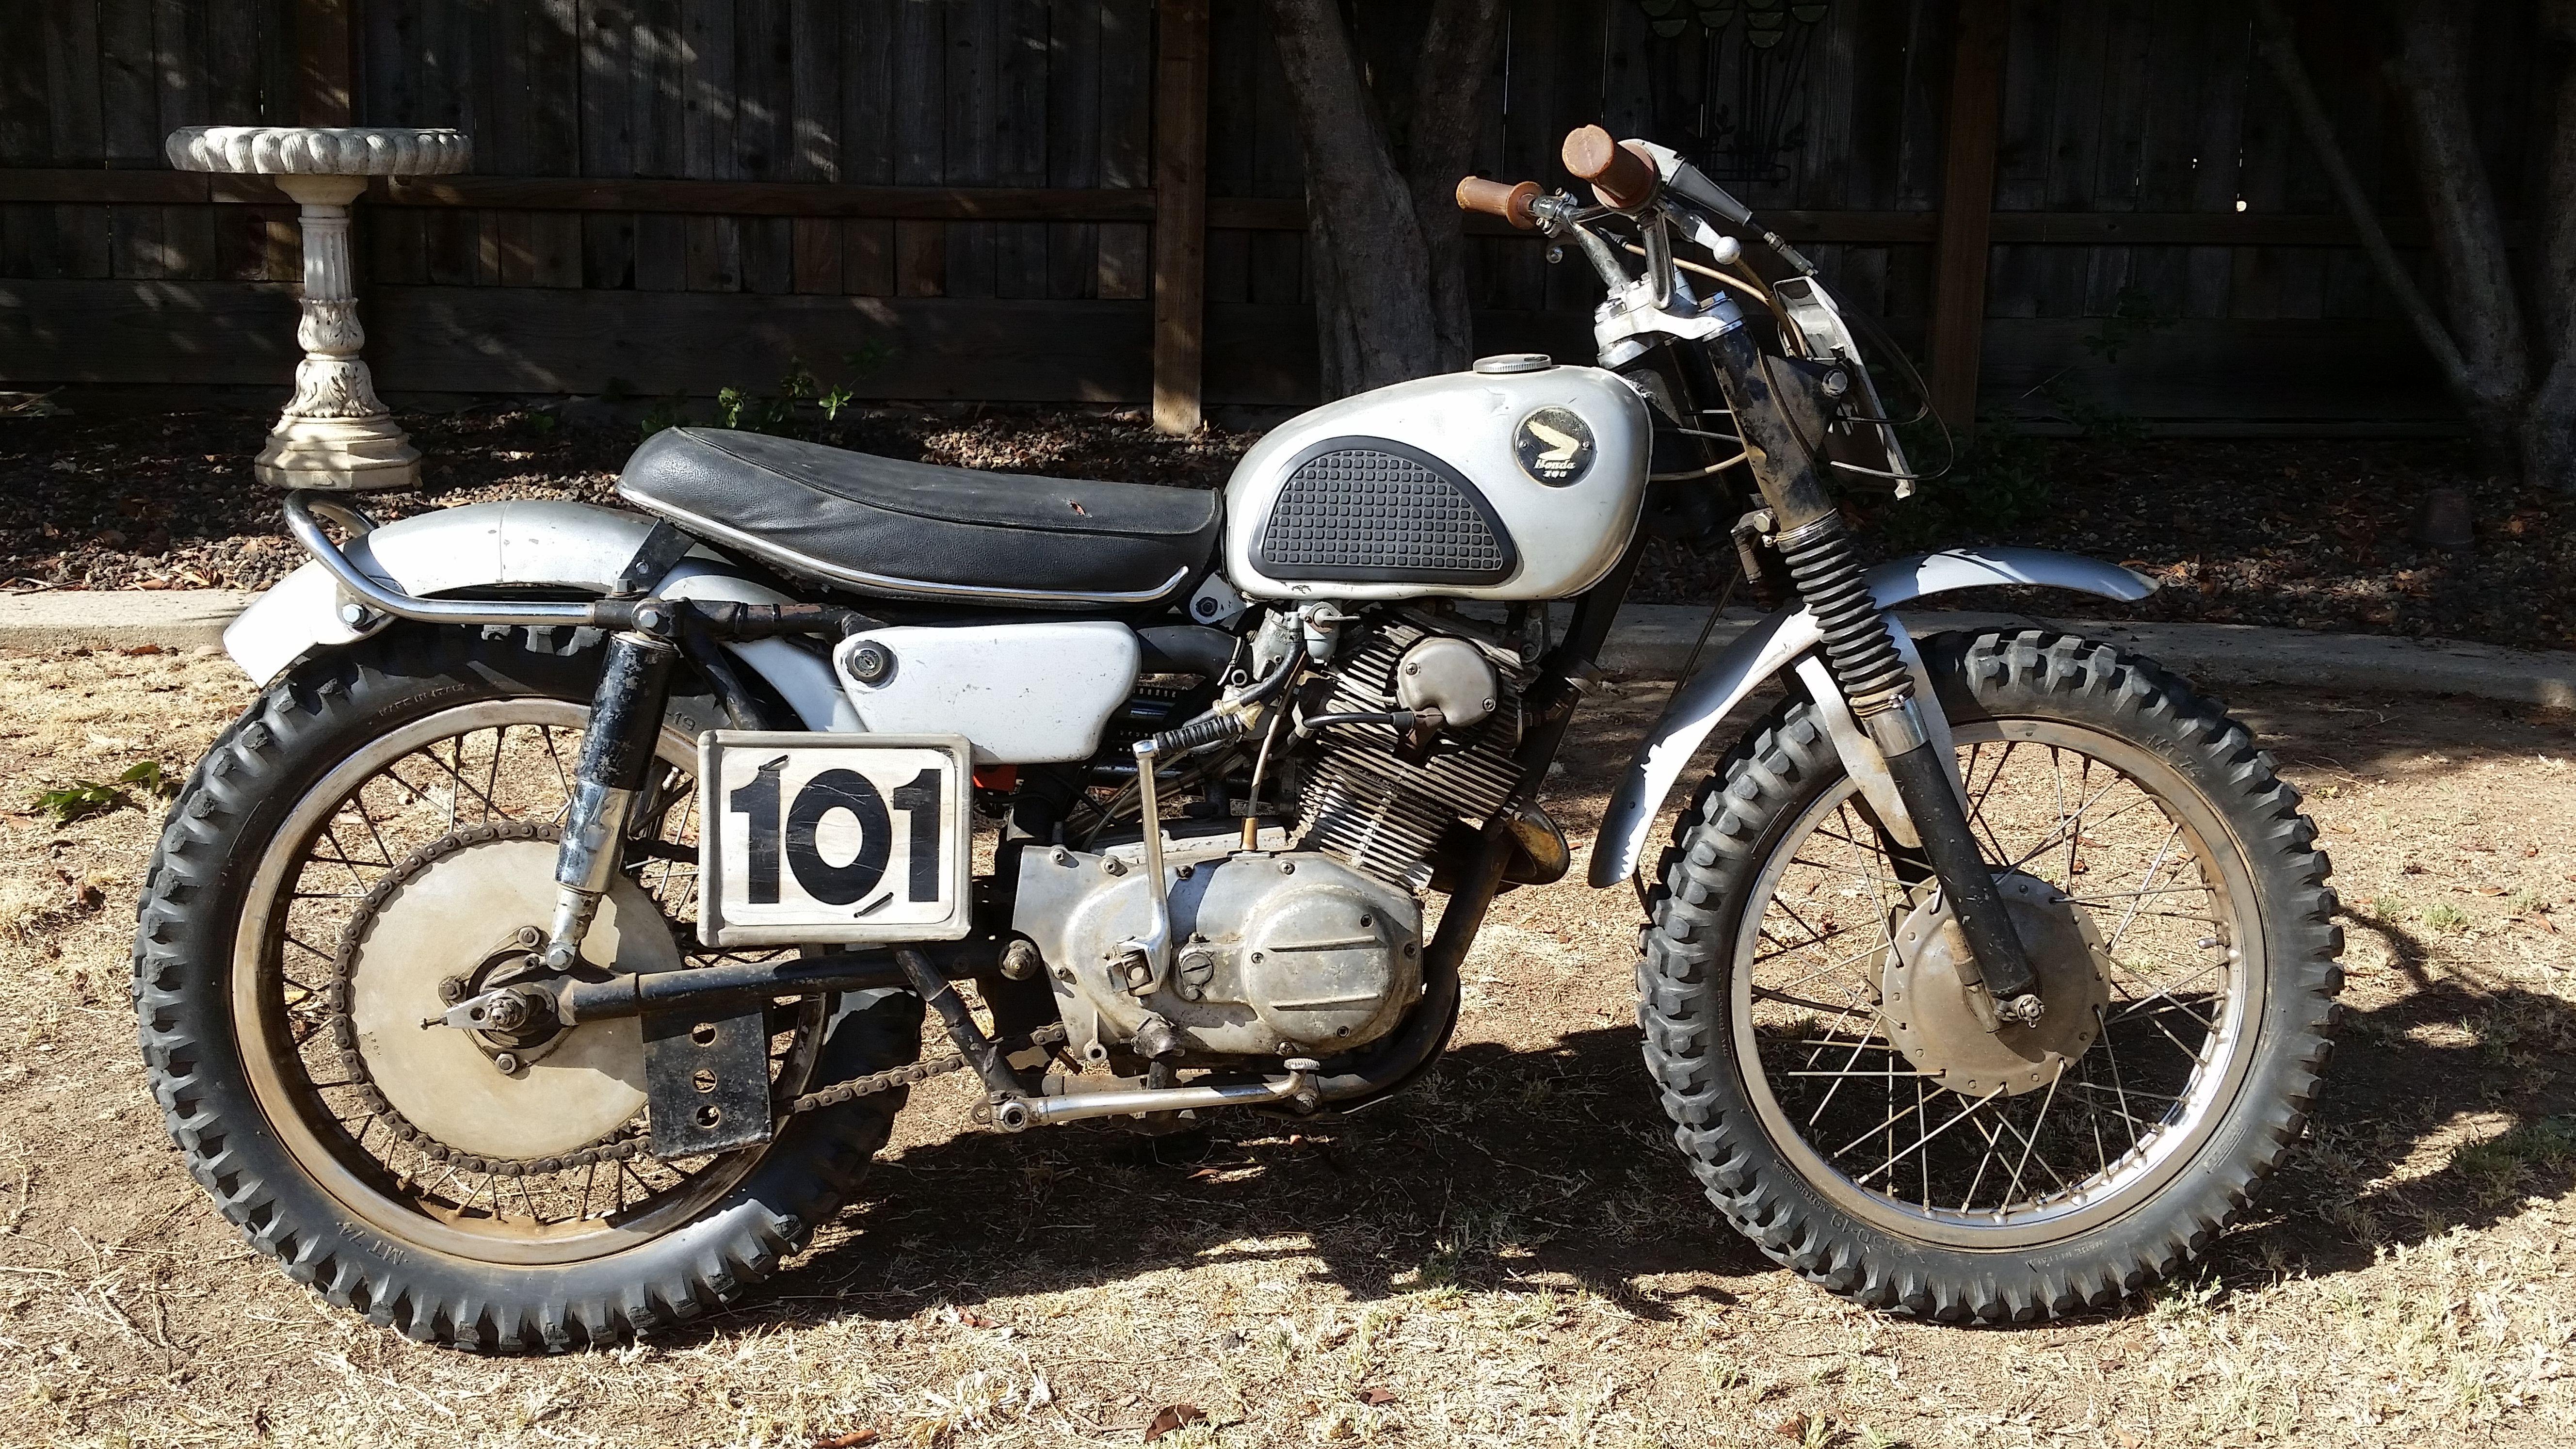 1965 Honda 305 Cl77 Race Scrambler Honda Scrambler Vintage Honda Motorcycles Honda [ 2988 x 5312 Pixel ]